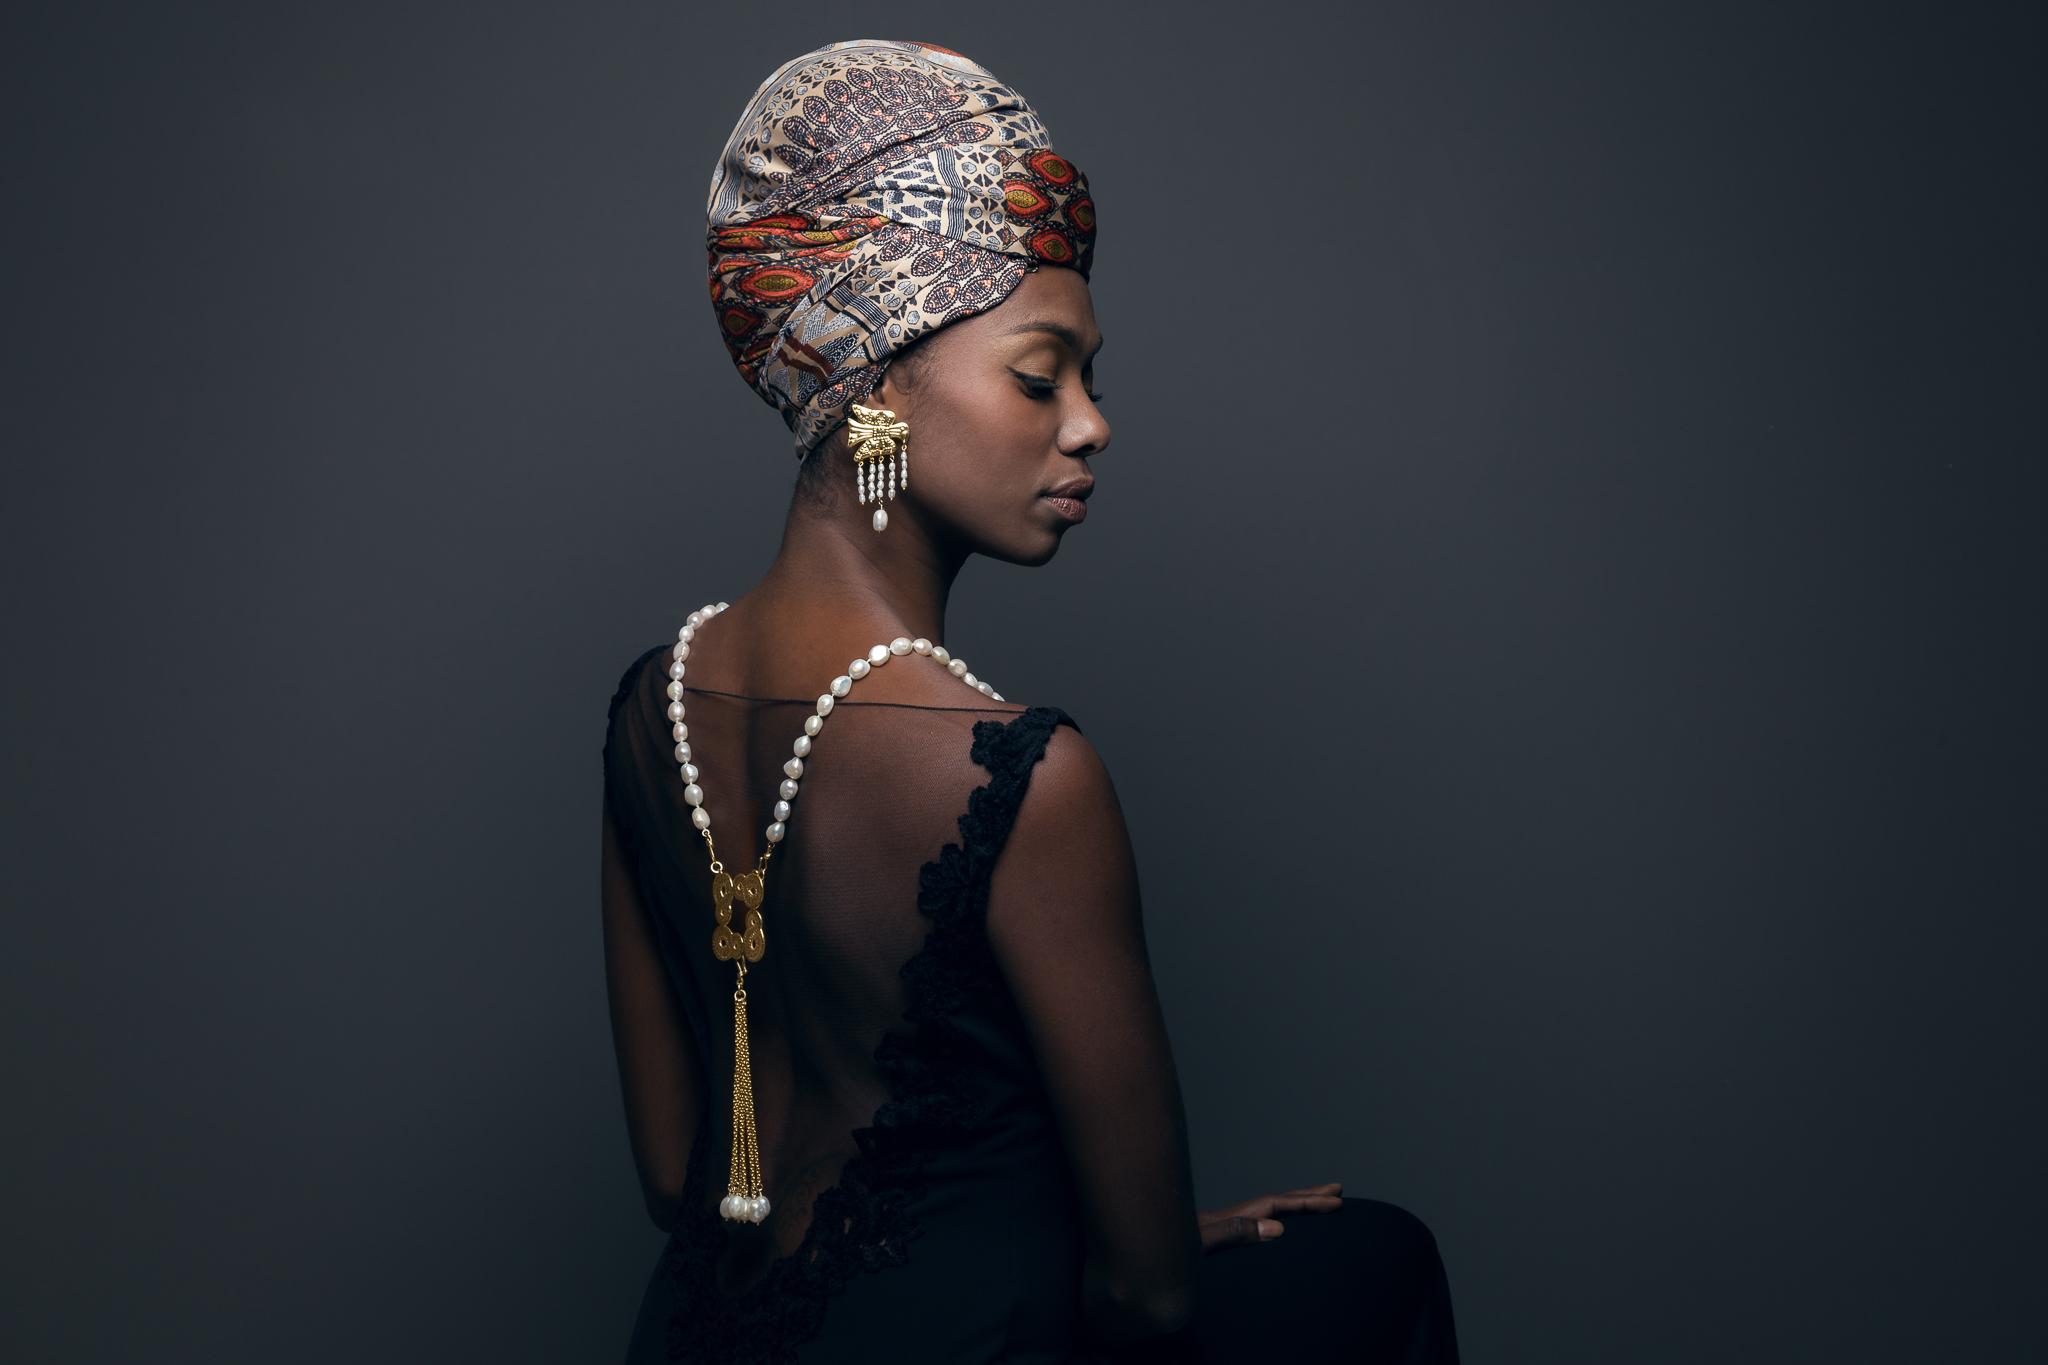 kostis sohoritis photography fashion Ukka Lelle lookbook 05.jpg